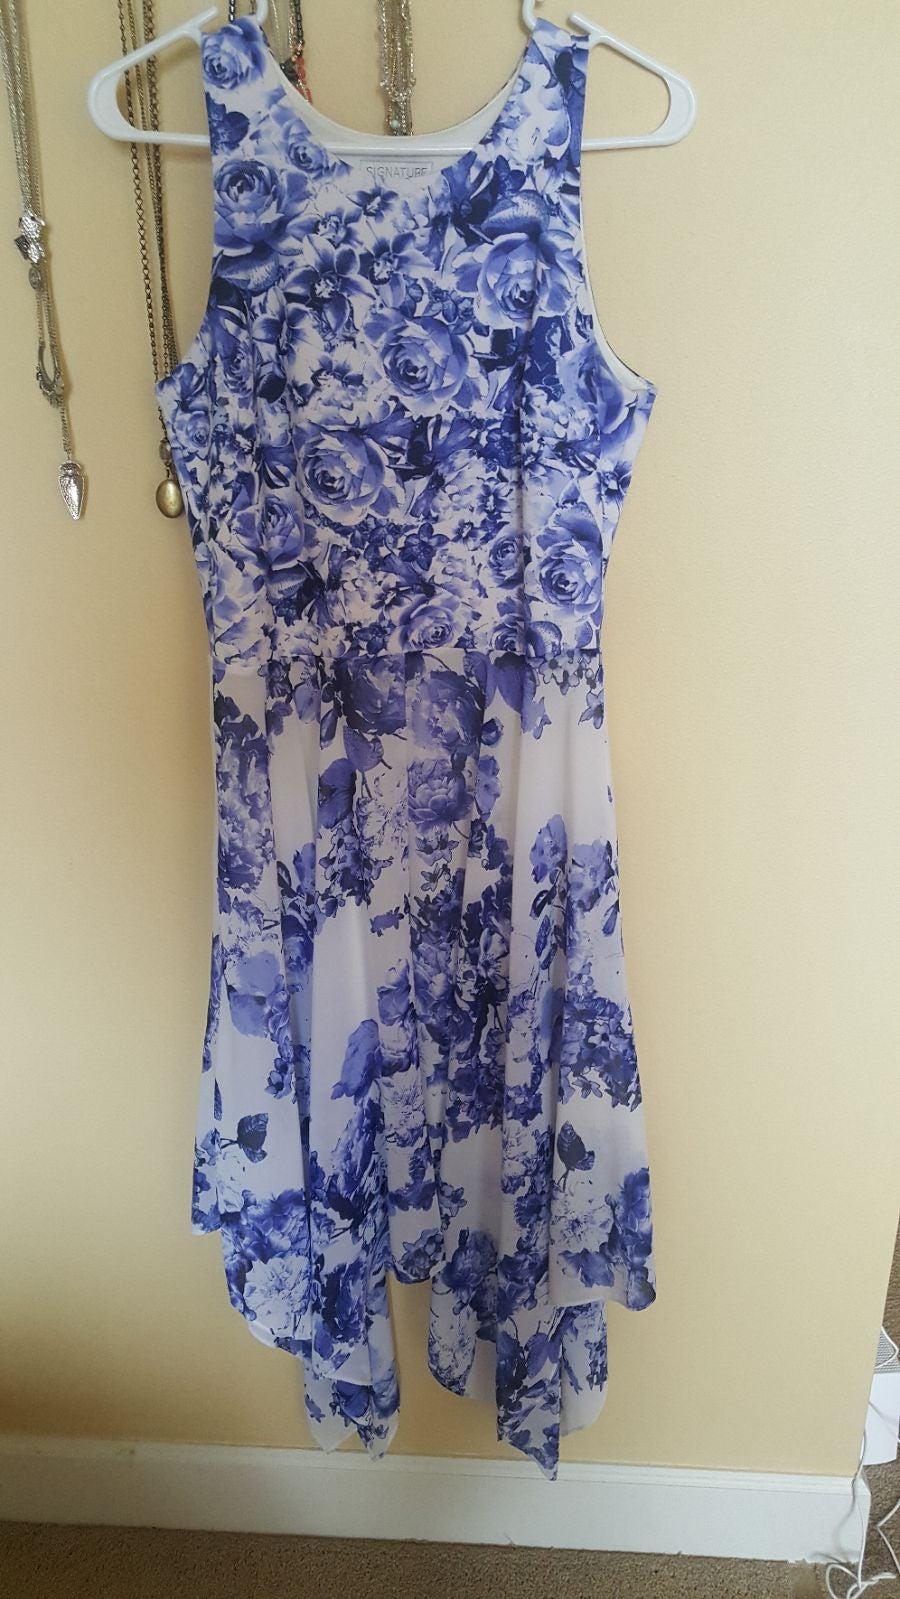 Floral midi dress with hanky hem